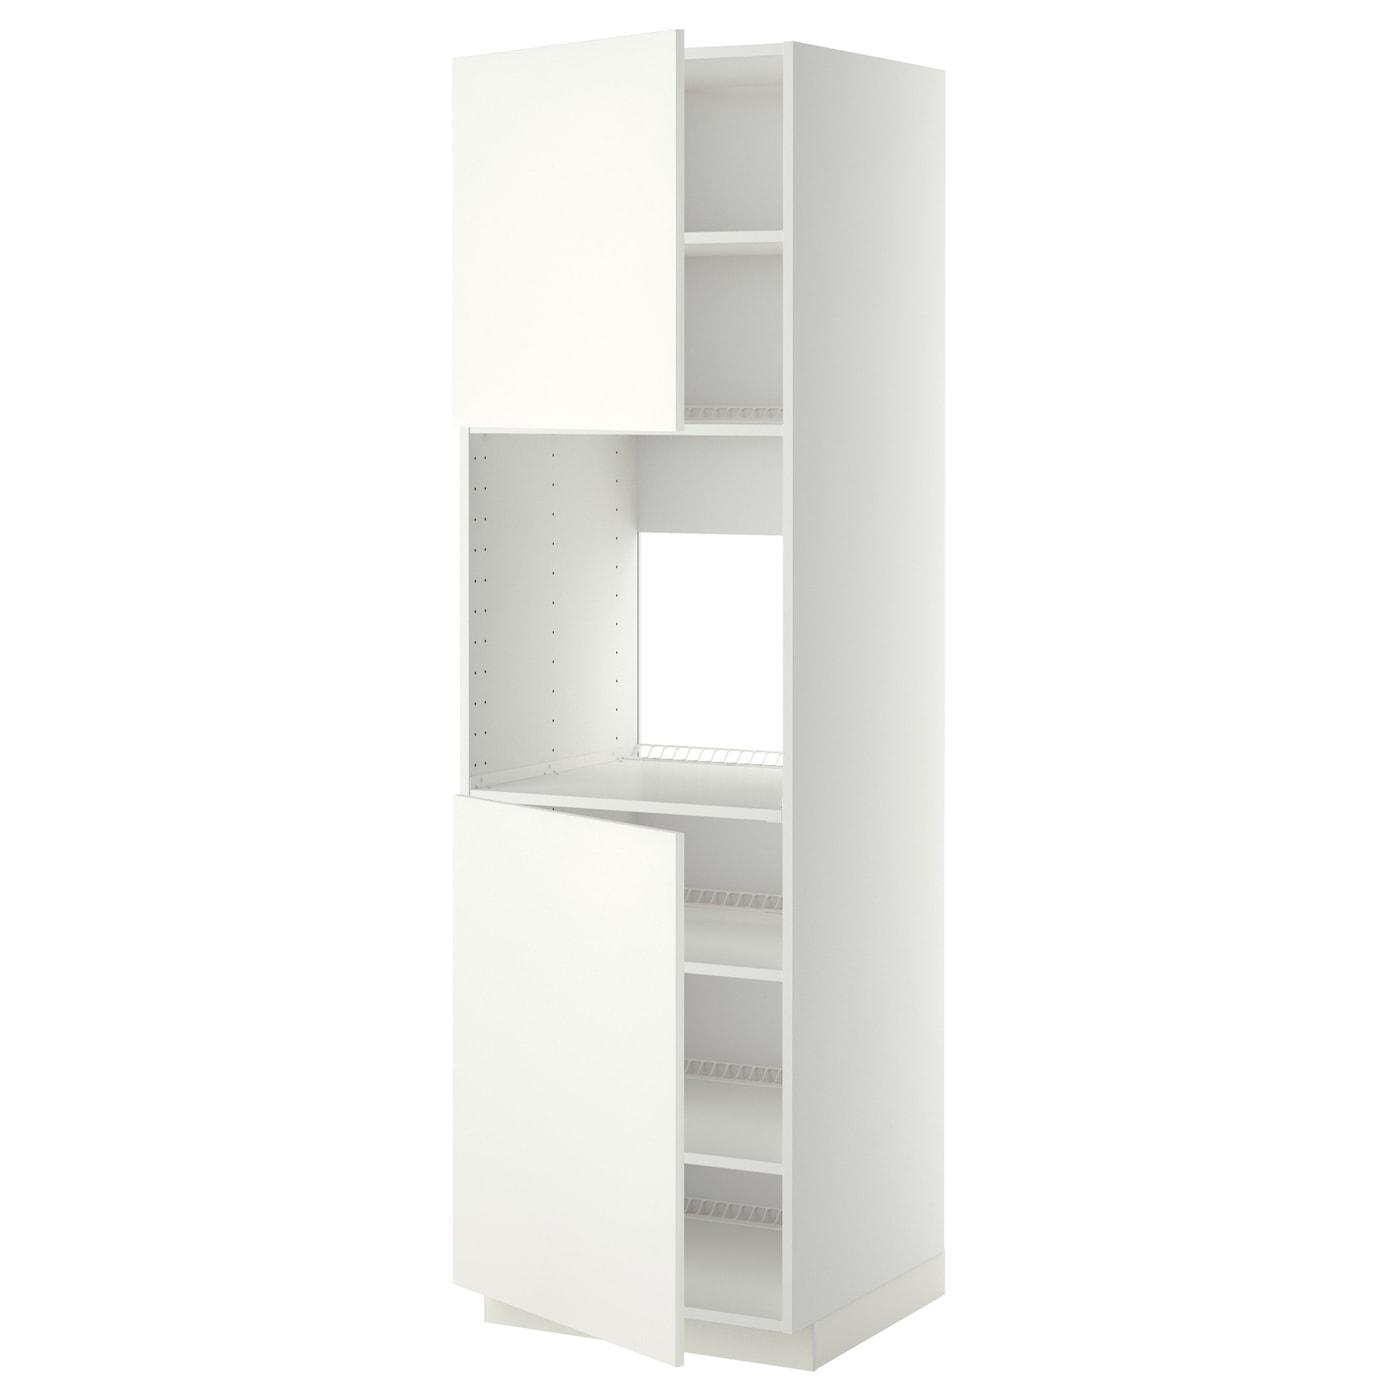 METOD Korpus Hochschrank/Kühl-/Ofen - weiß, 60x60x200 cm - IKEA